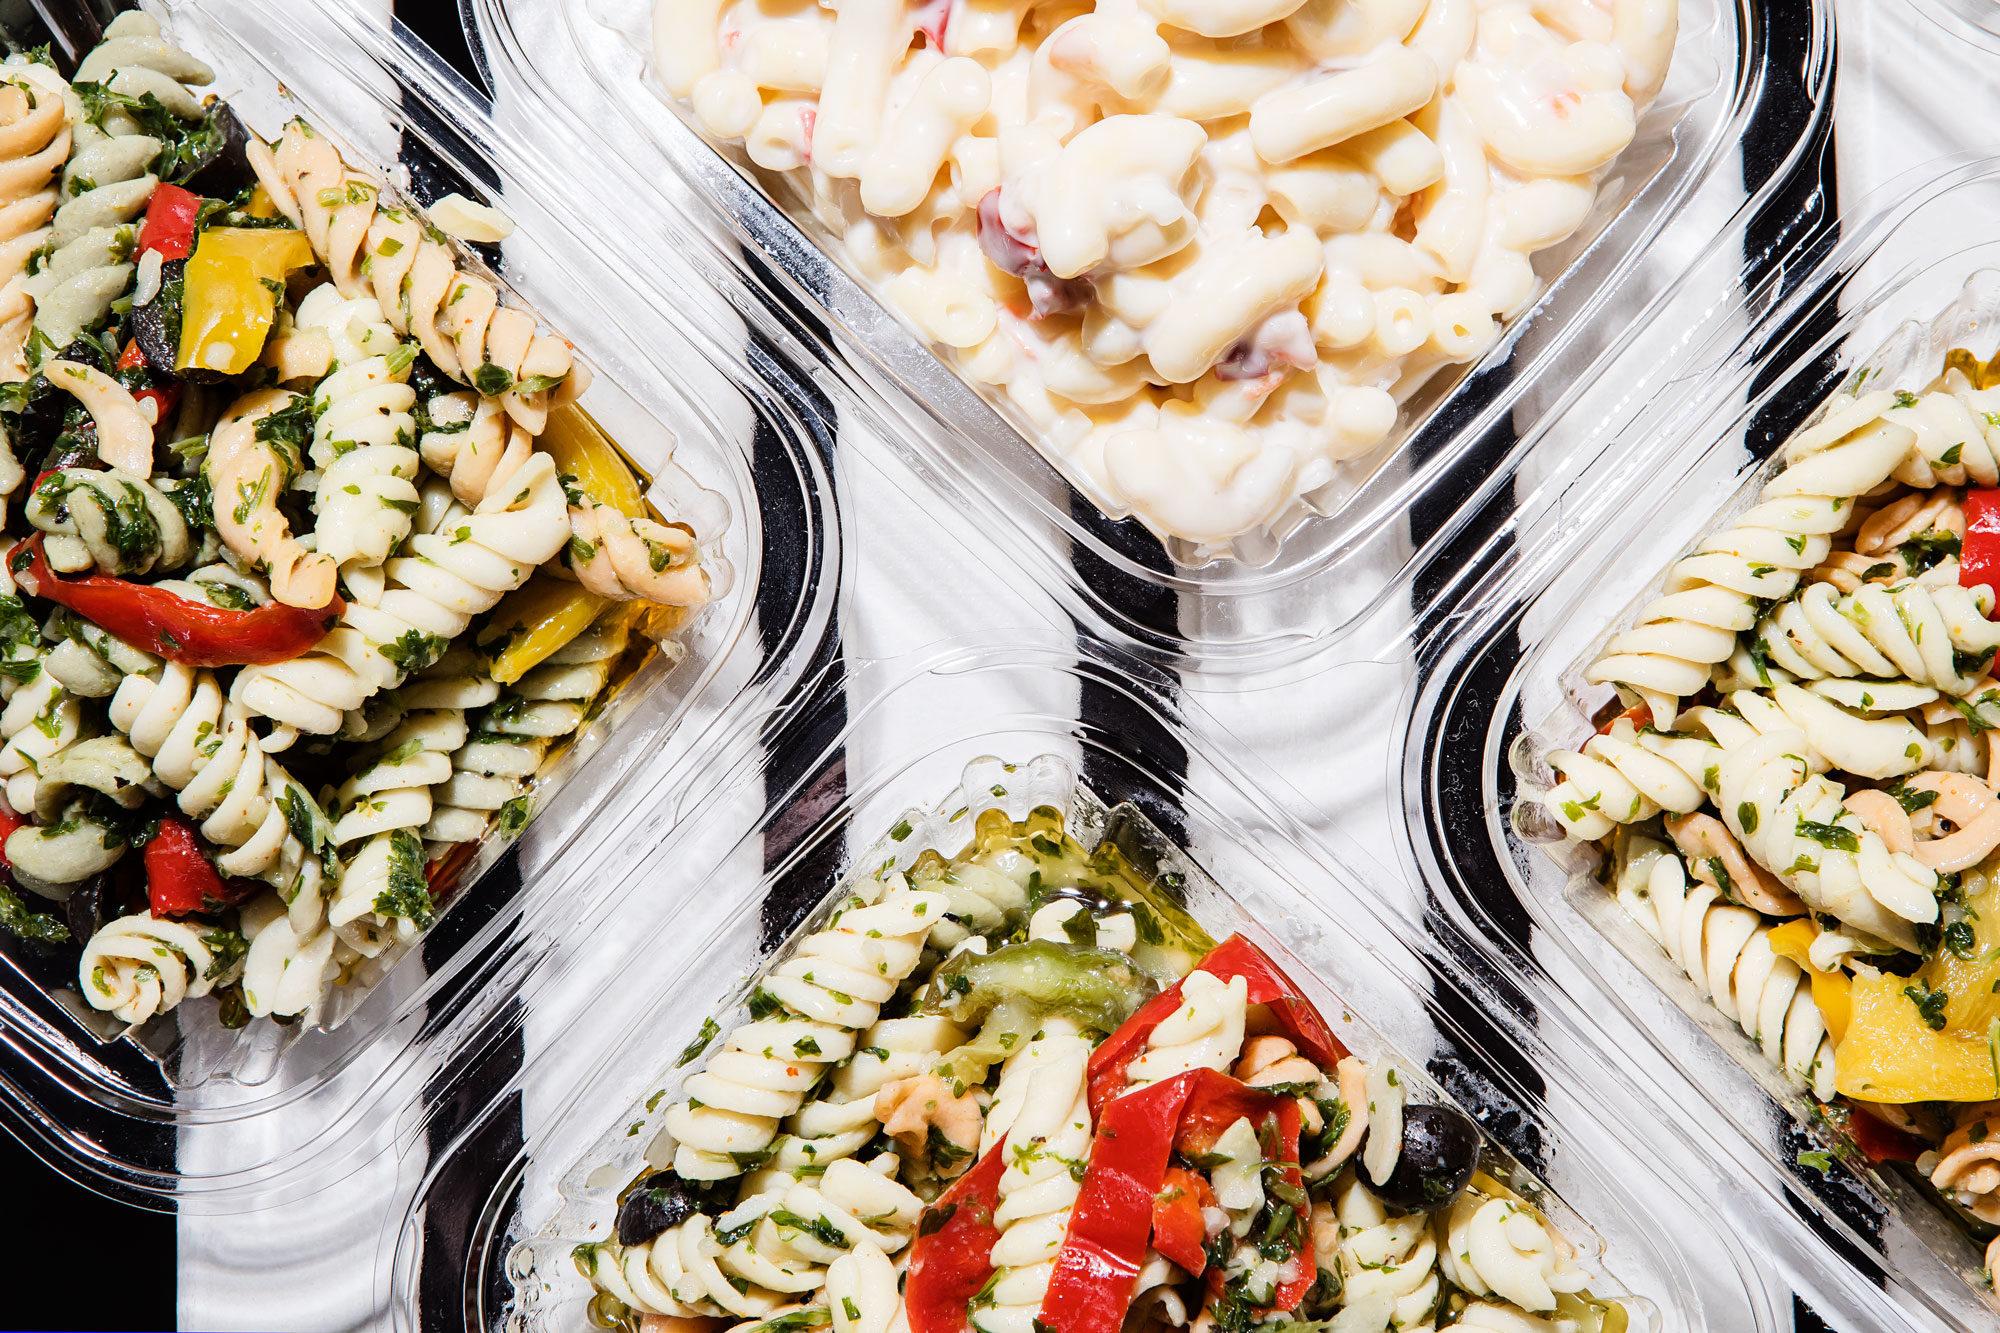 Article-Cold-Pasta-Salad